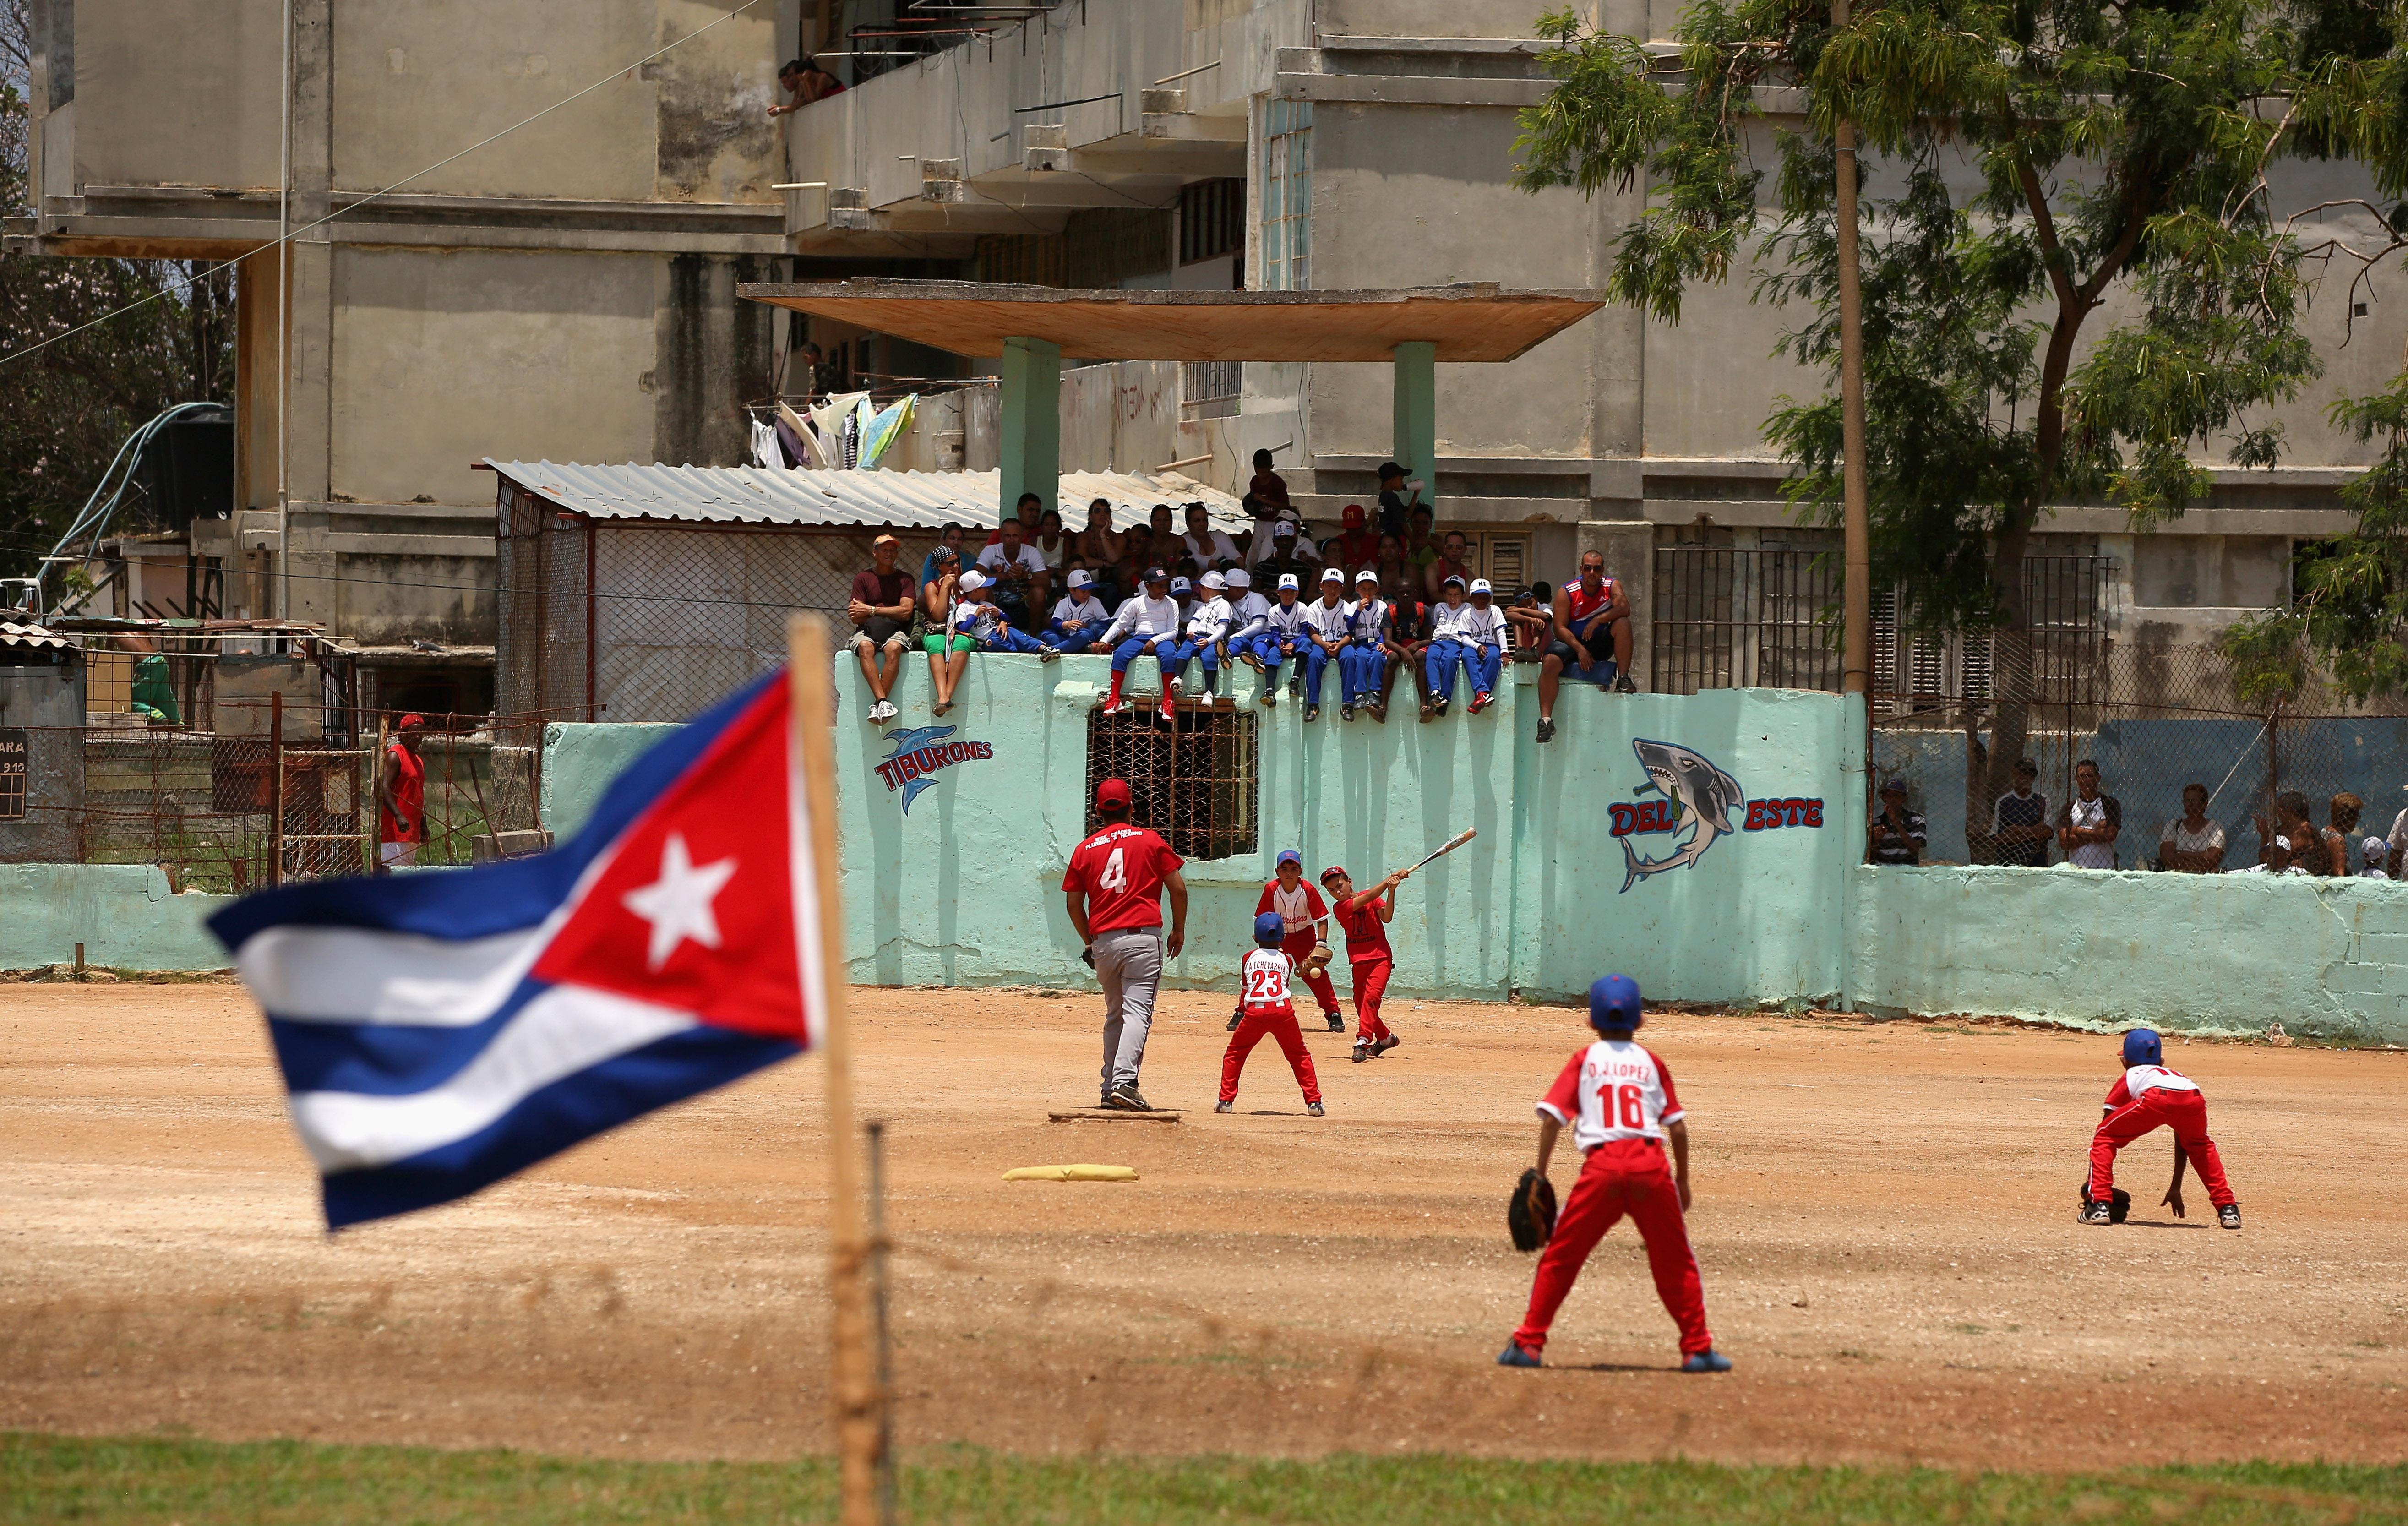 HAVANA, CUBA - MAY 09: The Cuban flag flies in the outfield as kids play baseball on May 09, 2015 in the Alamar subarb of Havana, Cuba.